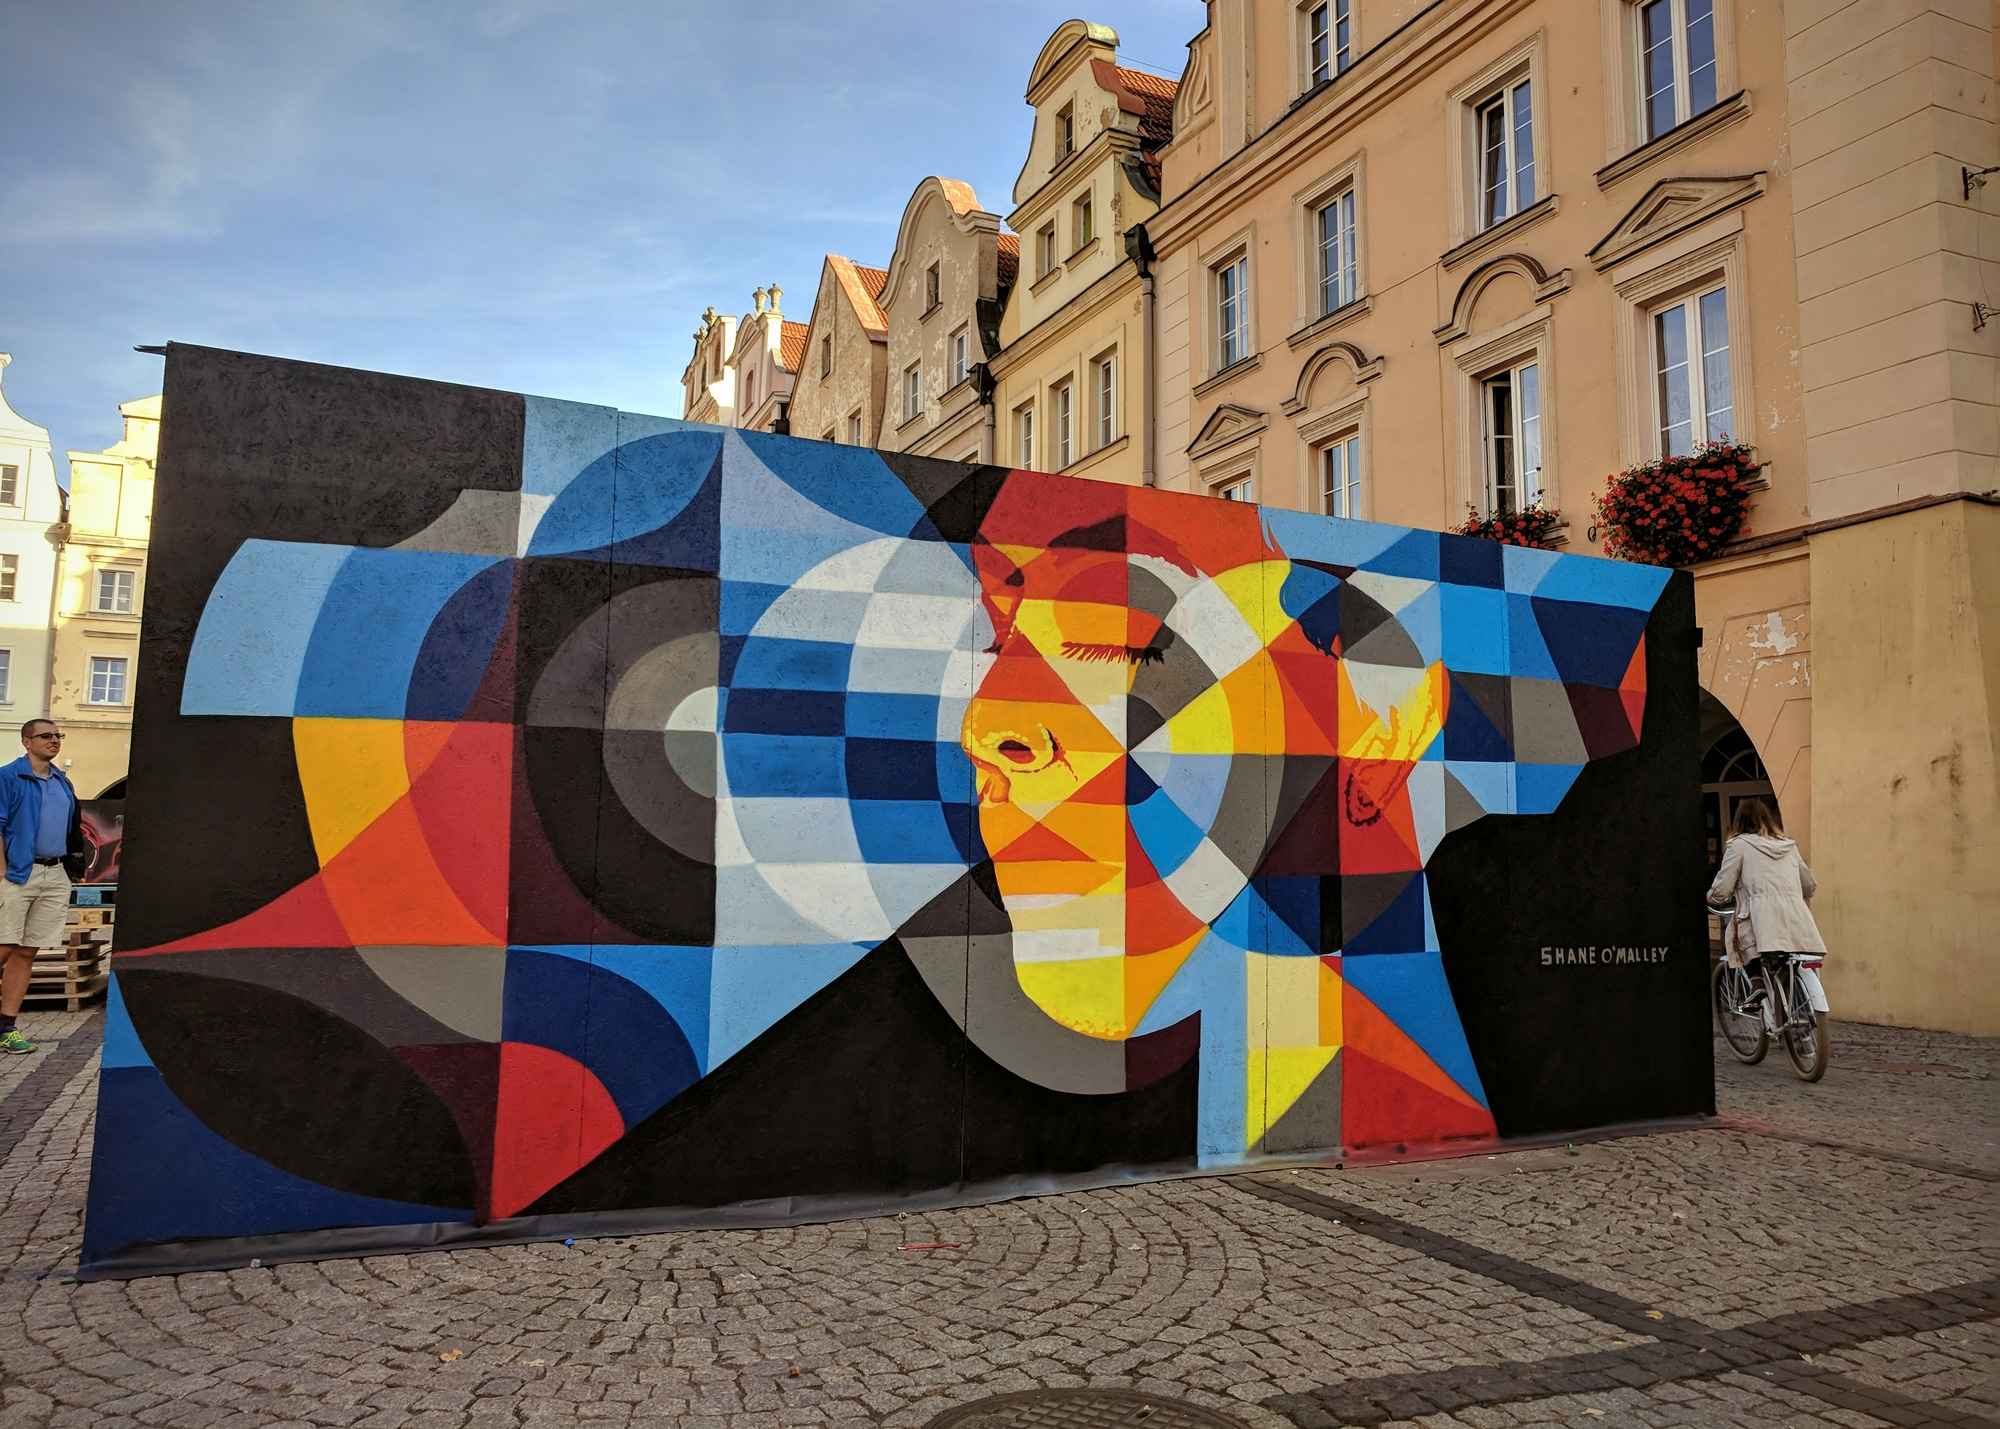 Mural painted Poland months sun - shaneomalleyart   ello